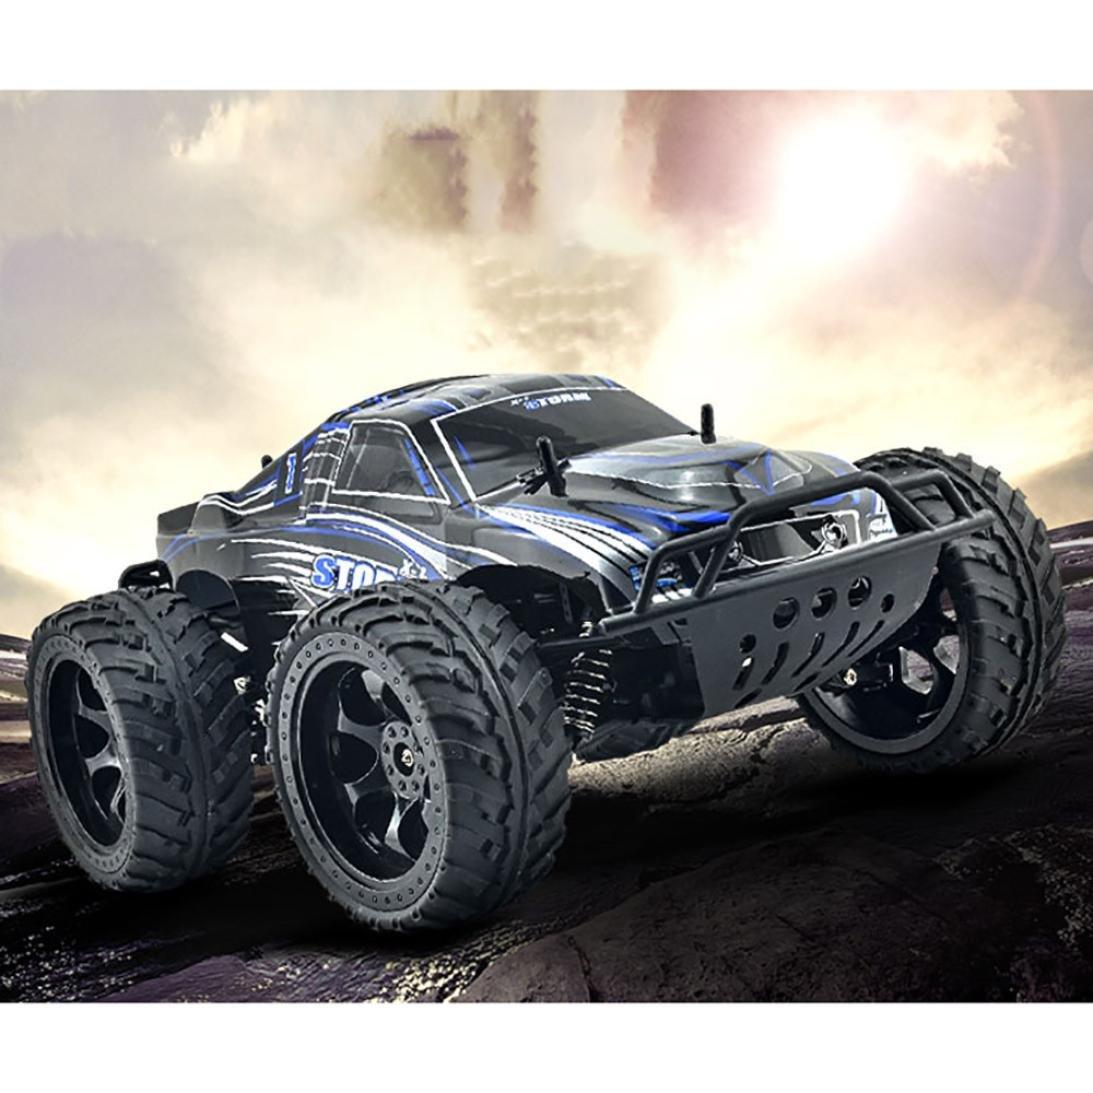 Excellent 990 1:10 Four-Wheel Drive Off-Road Vehicle Remote High-Speed Drift Dreamyth (Blue) by Dreamyth